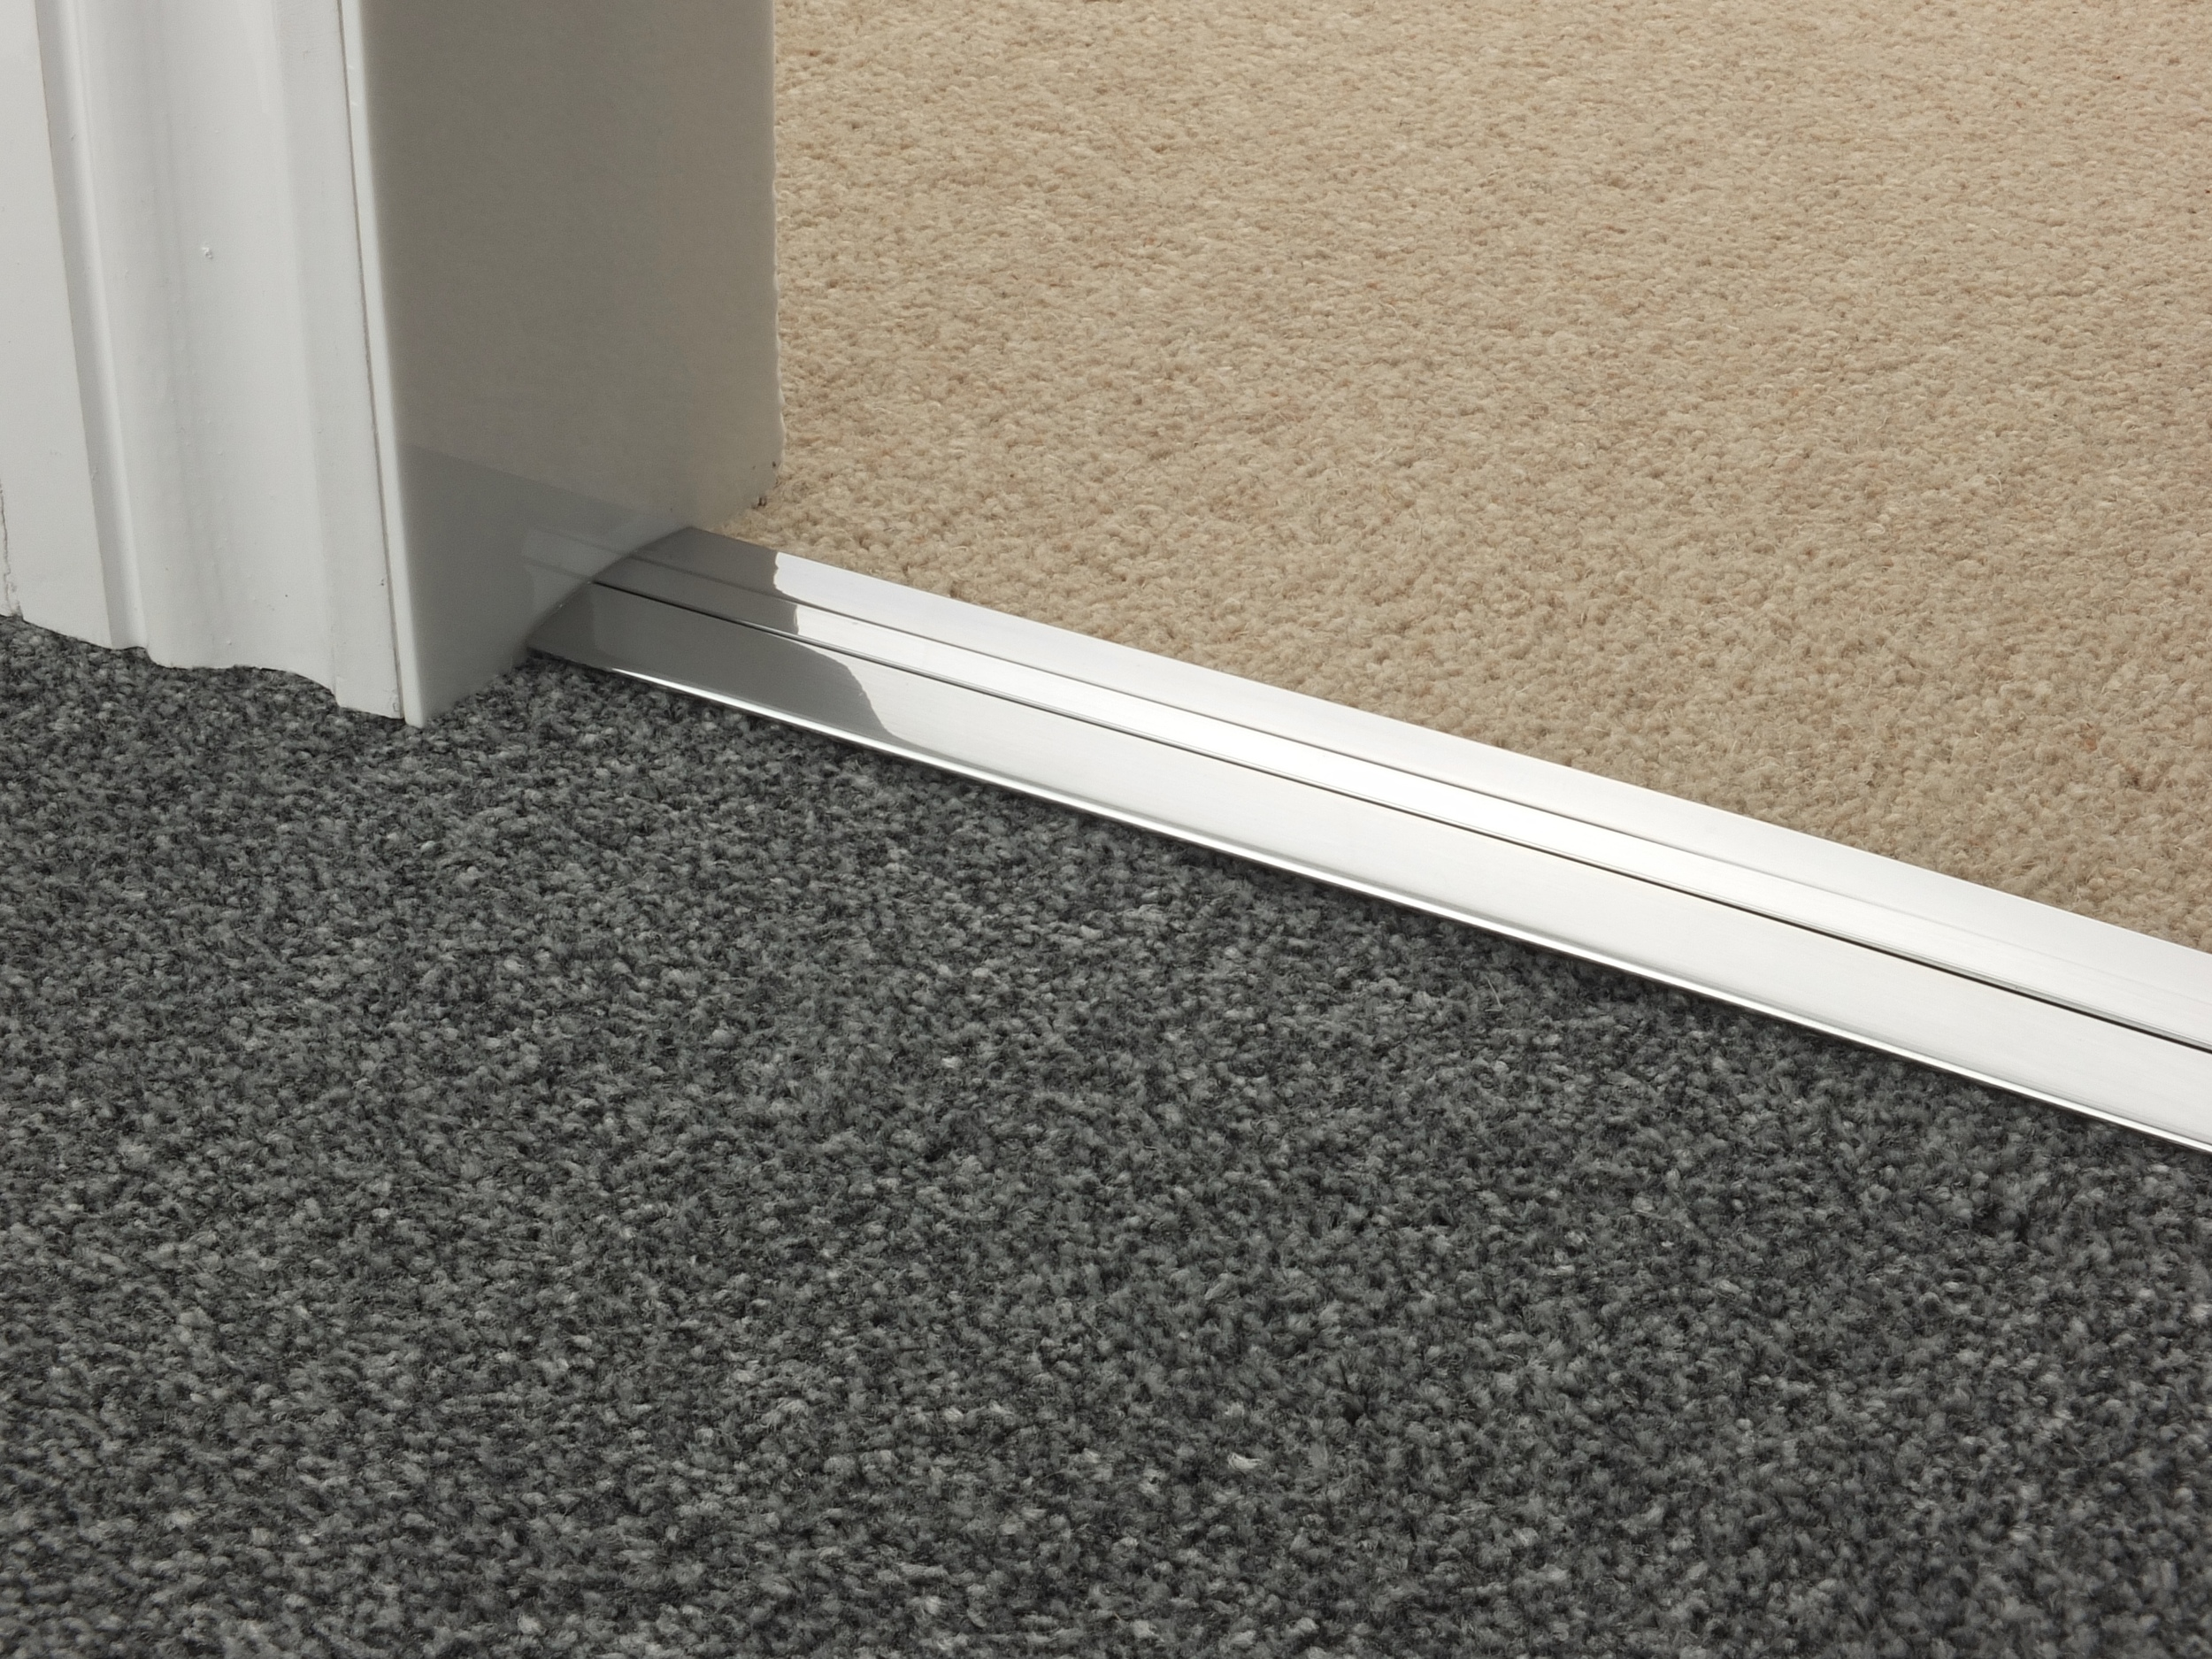 door_bar_brushed_chrome_posh38_carpet_carpet.jpg